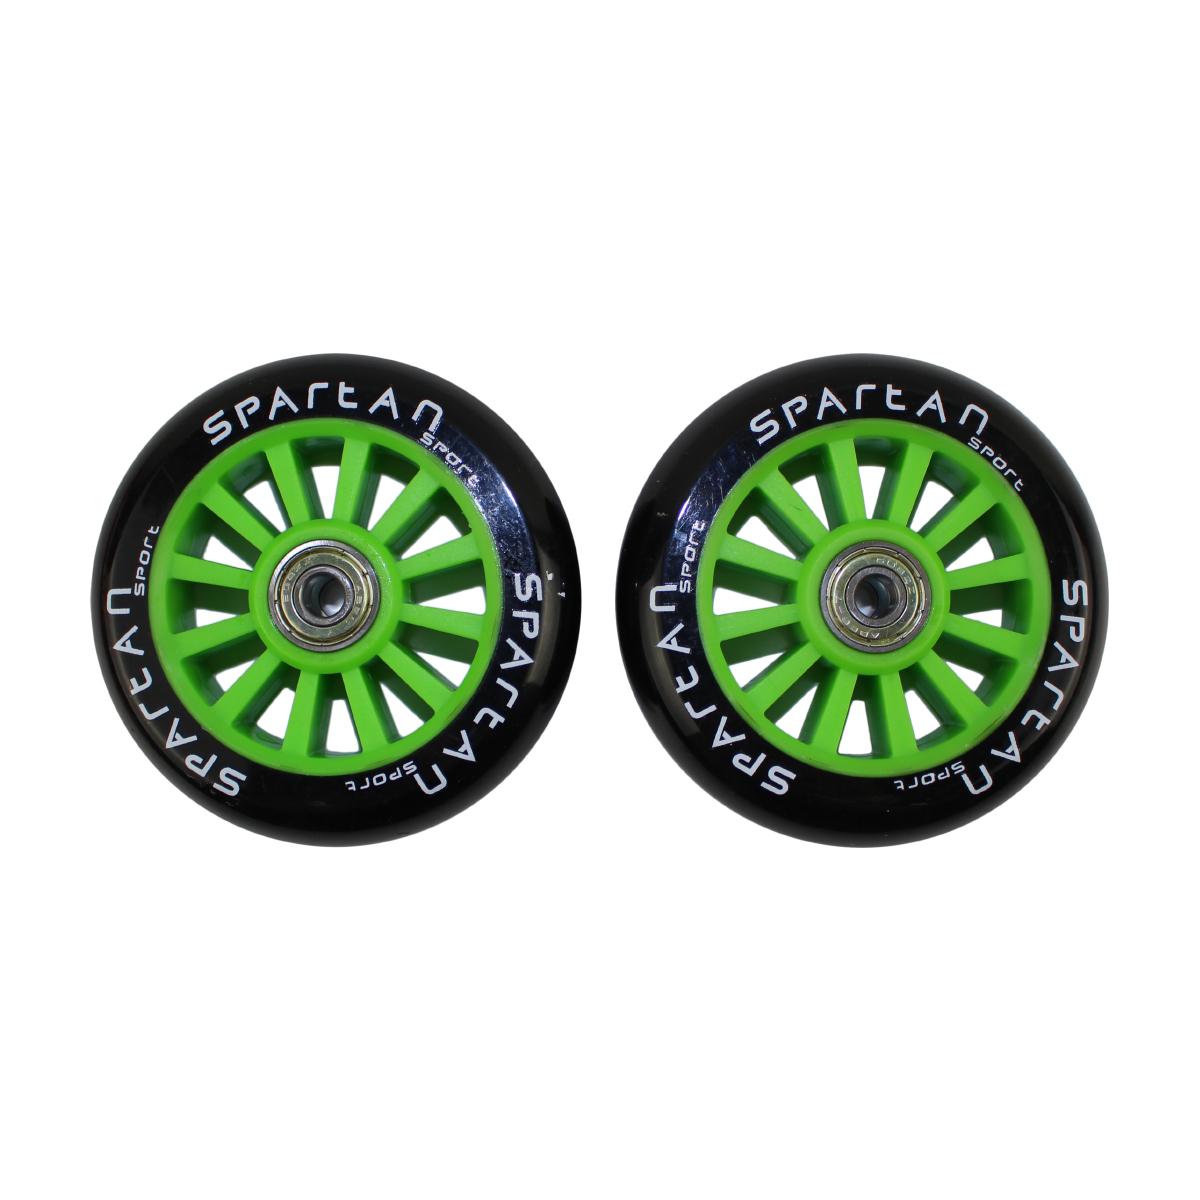 Náhradné kolieska na kolobežky SPARTAN Stunt 100 mm - zelené